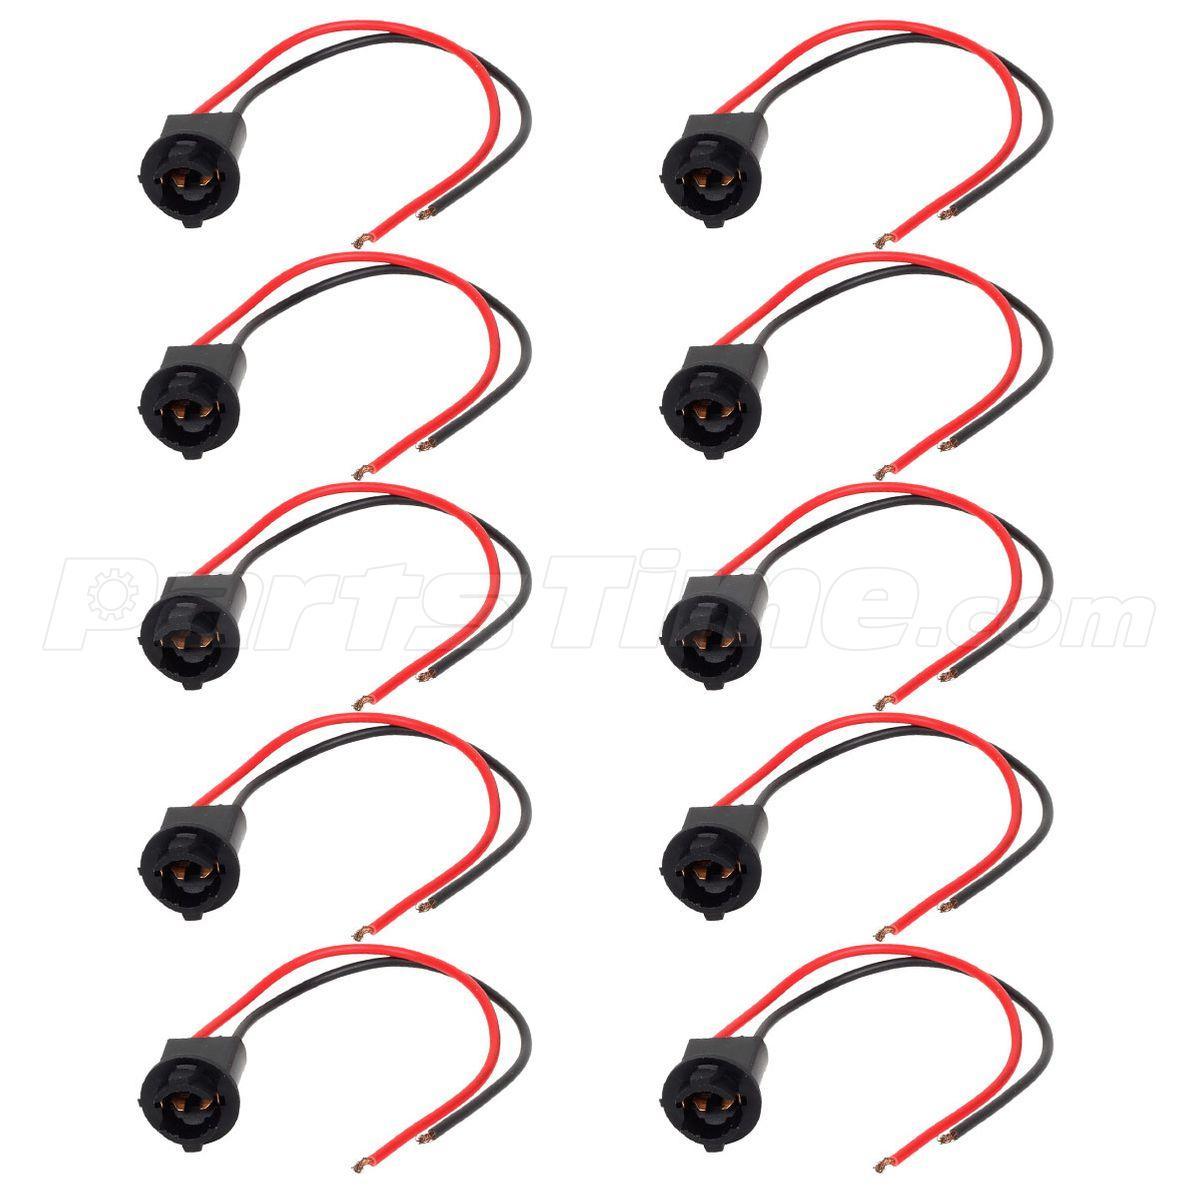 132450 1?rn=3901236 10xt10 194 extension harness plugs connectors wiring sockets 2011 Dodge Nitro at eliteediting.co